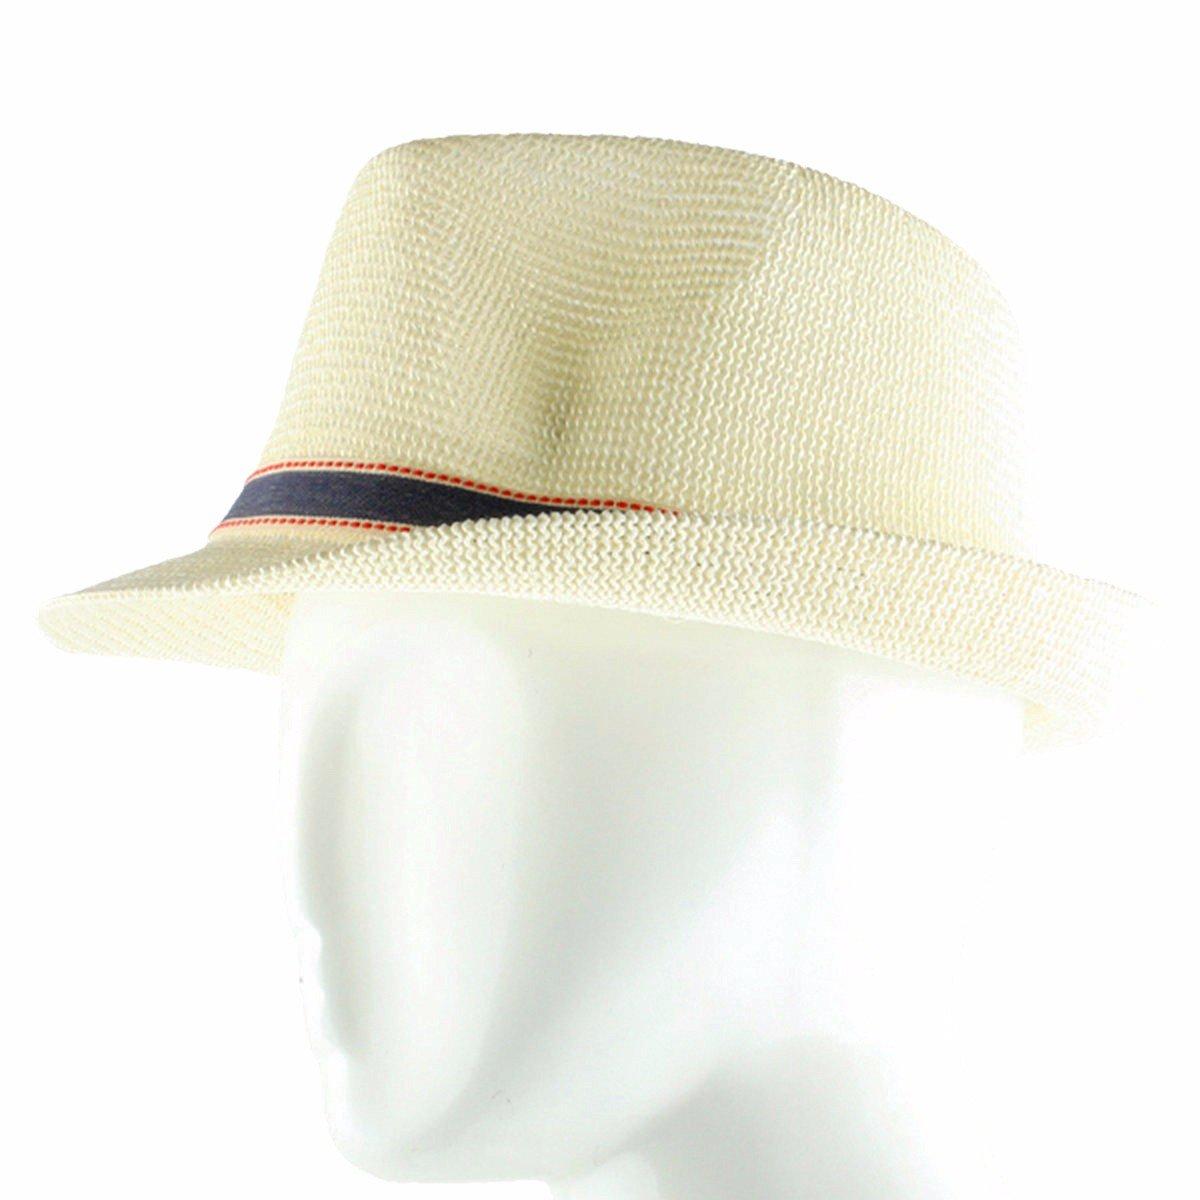 af56701cf8b373 Samtree Fedora Hats for Women Men,Beathable Straw Panama Hat AM0401-2